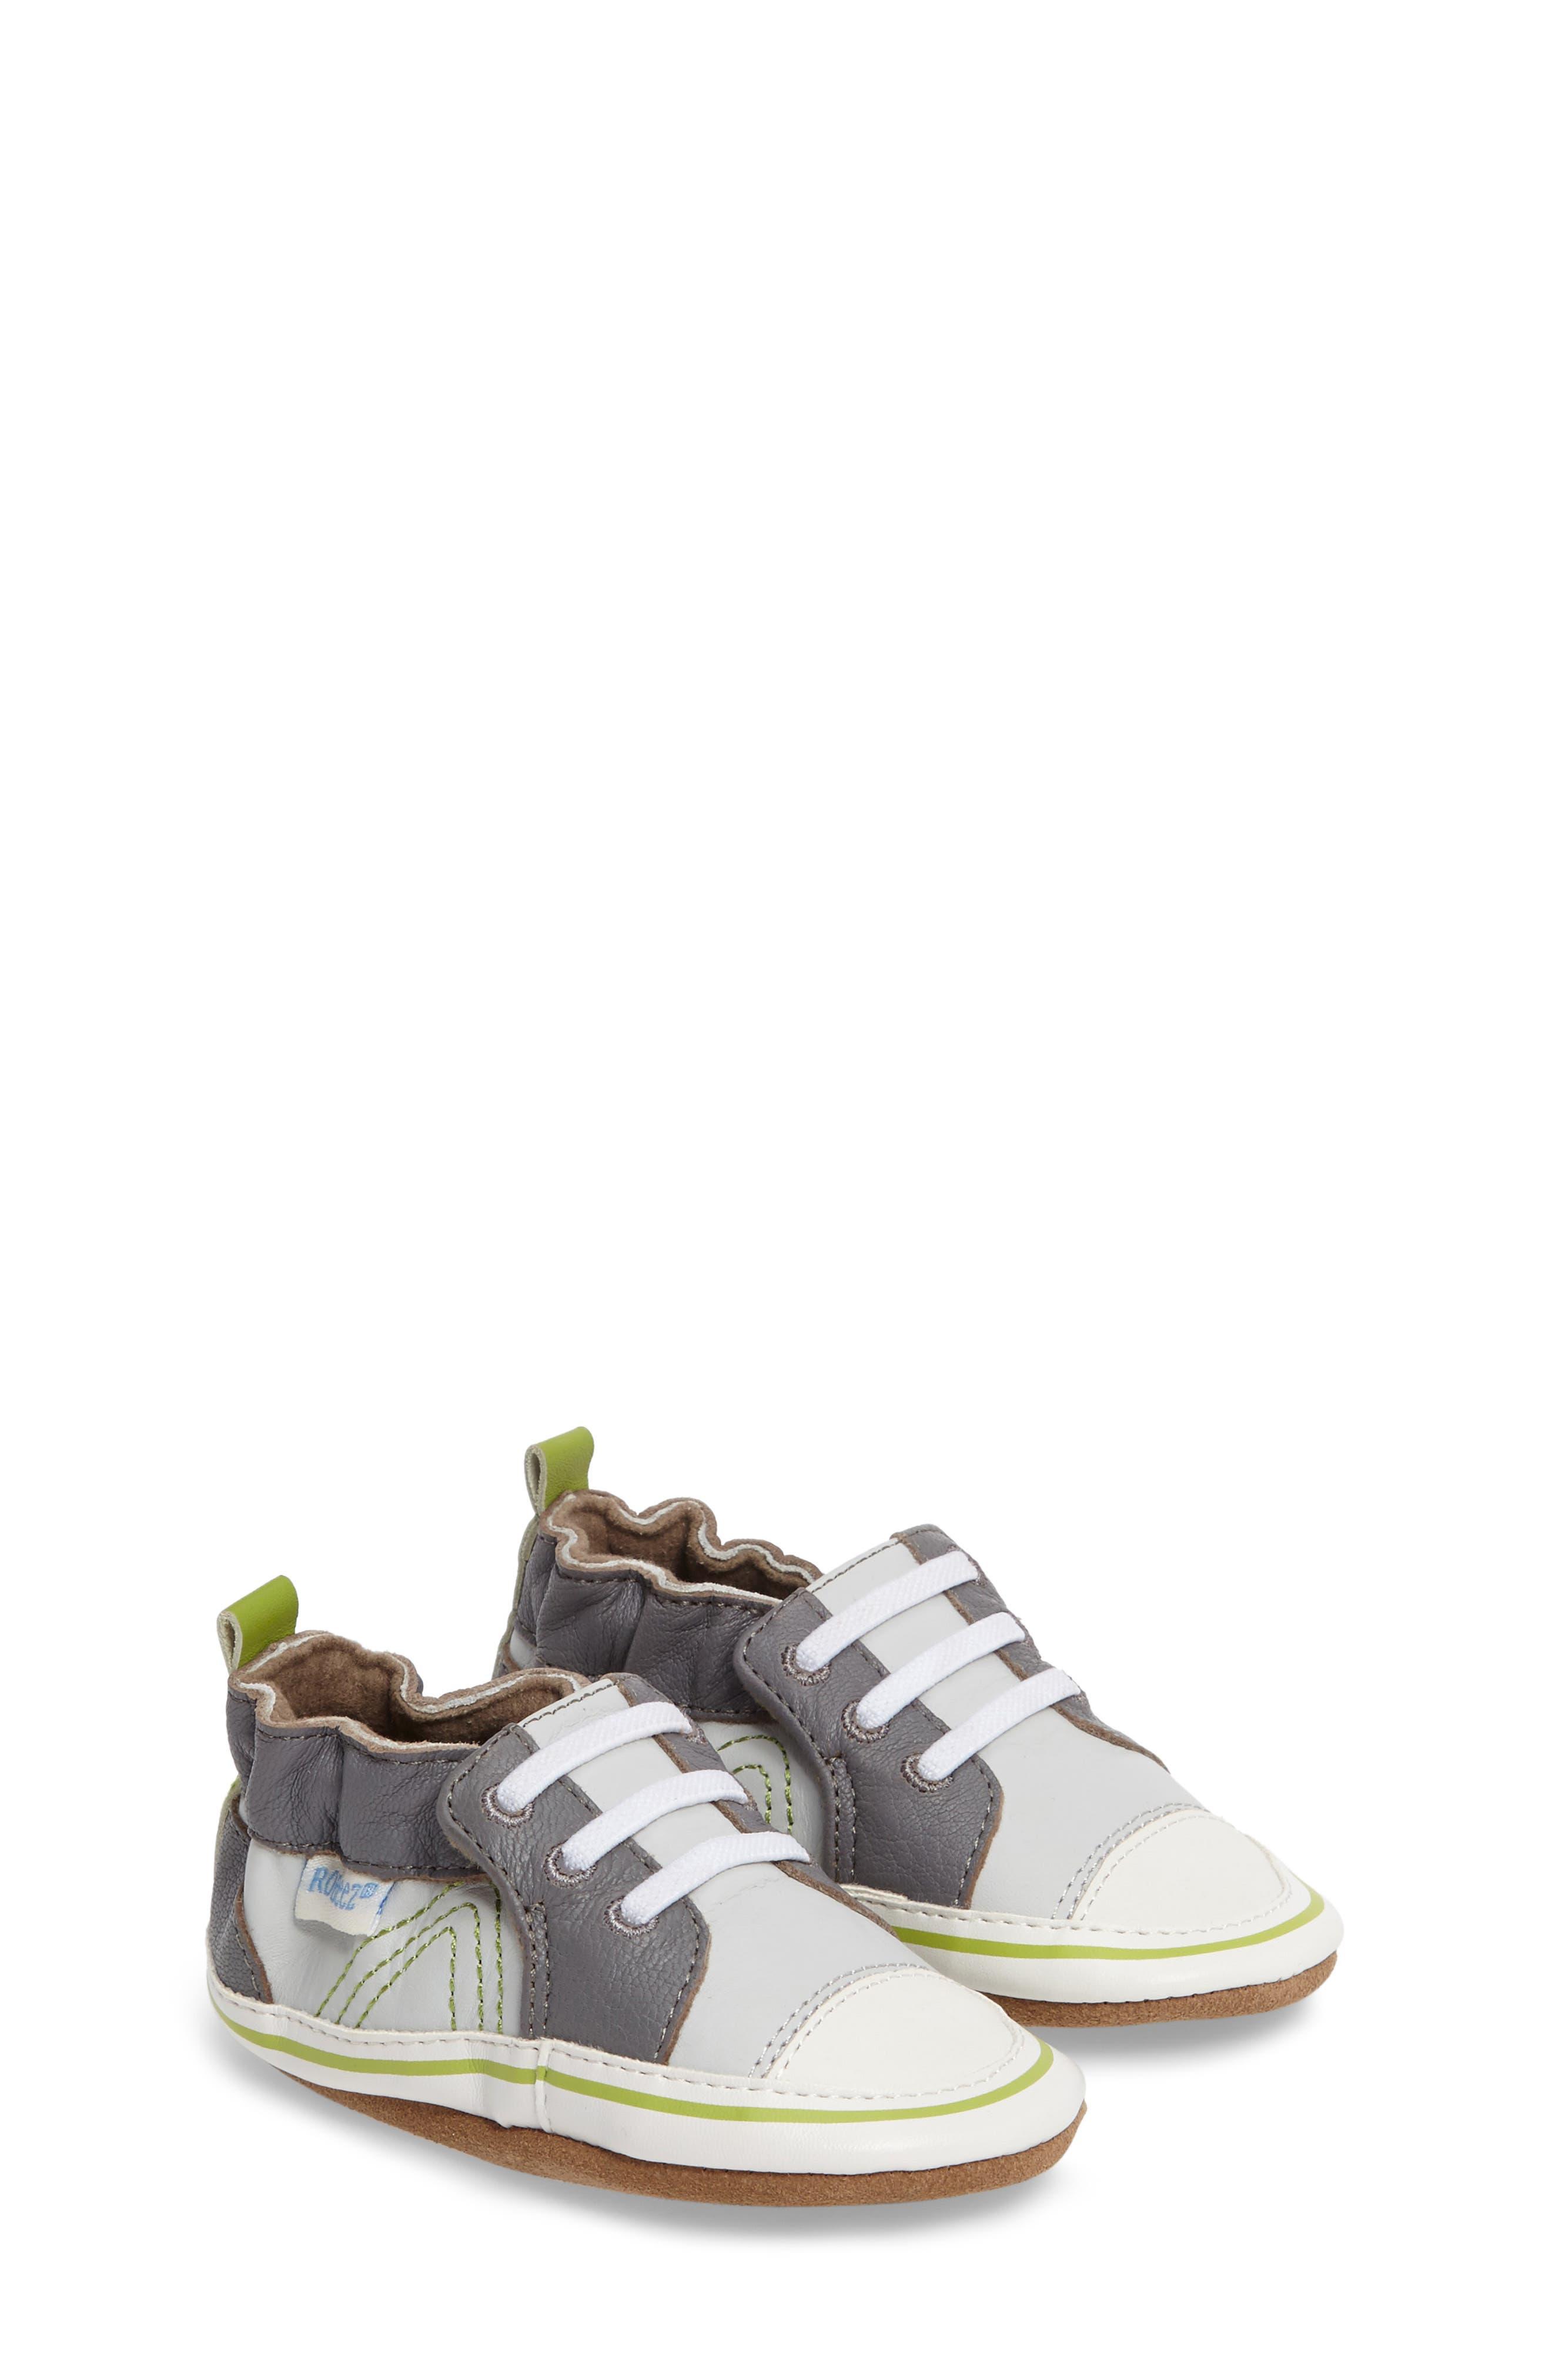 Boys Robeez Trendy Trainer Sneaker Crib Shoe